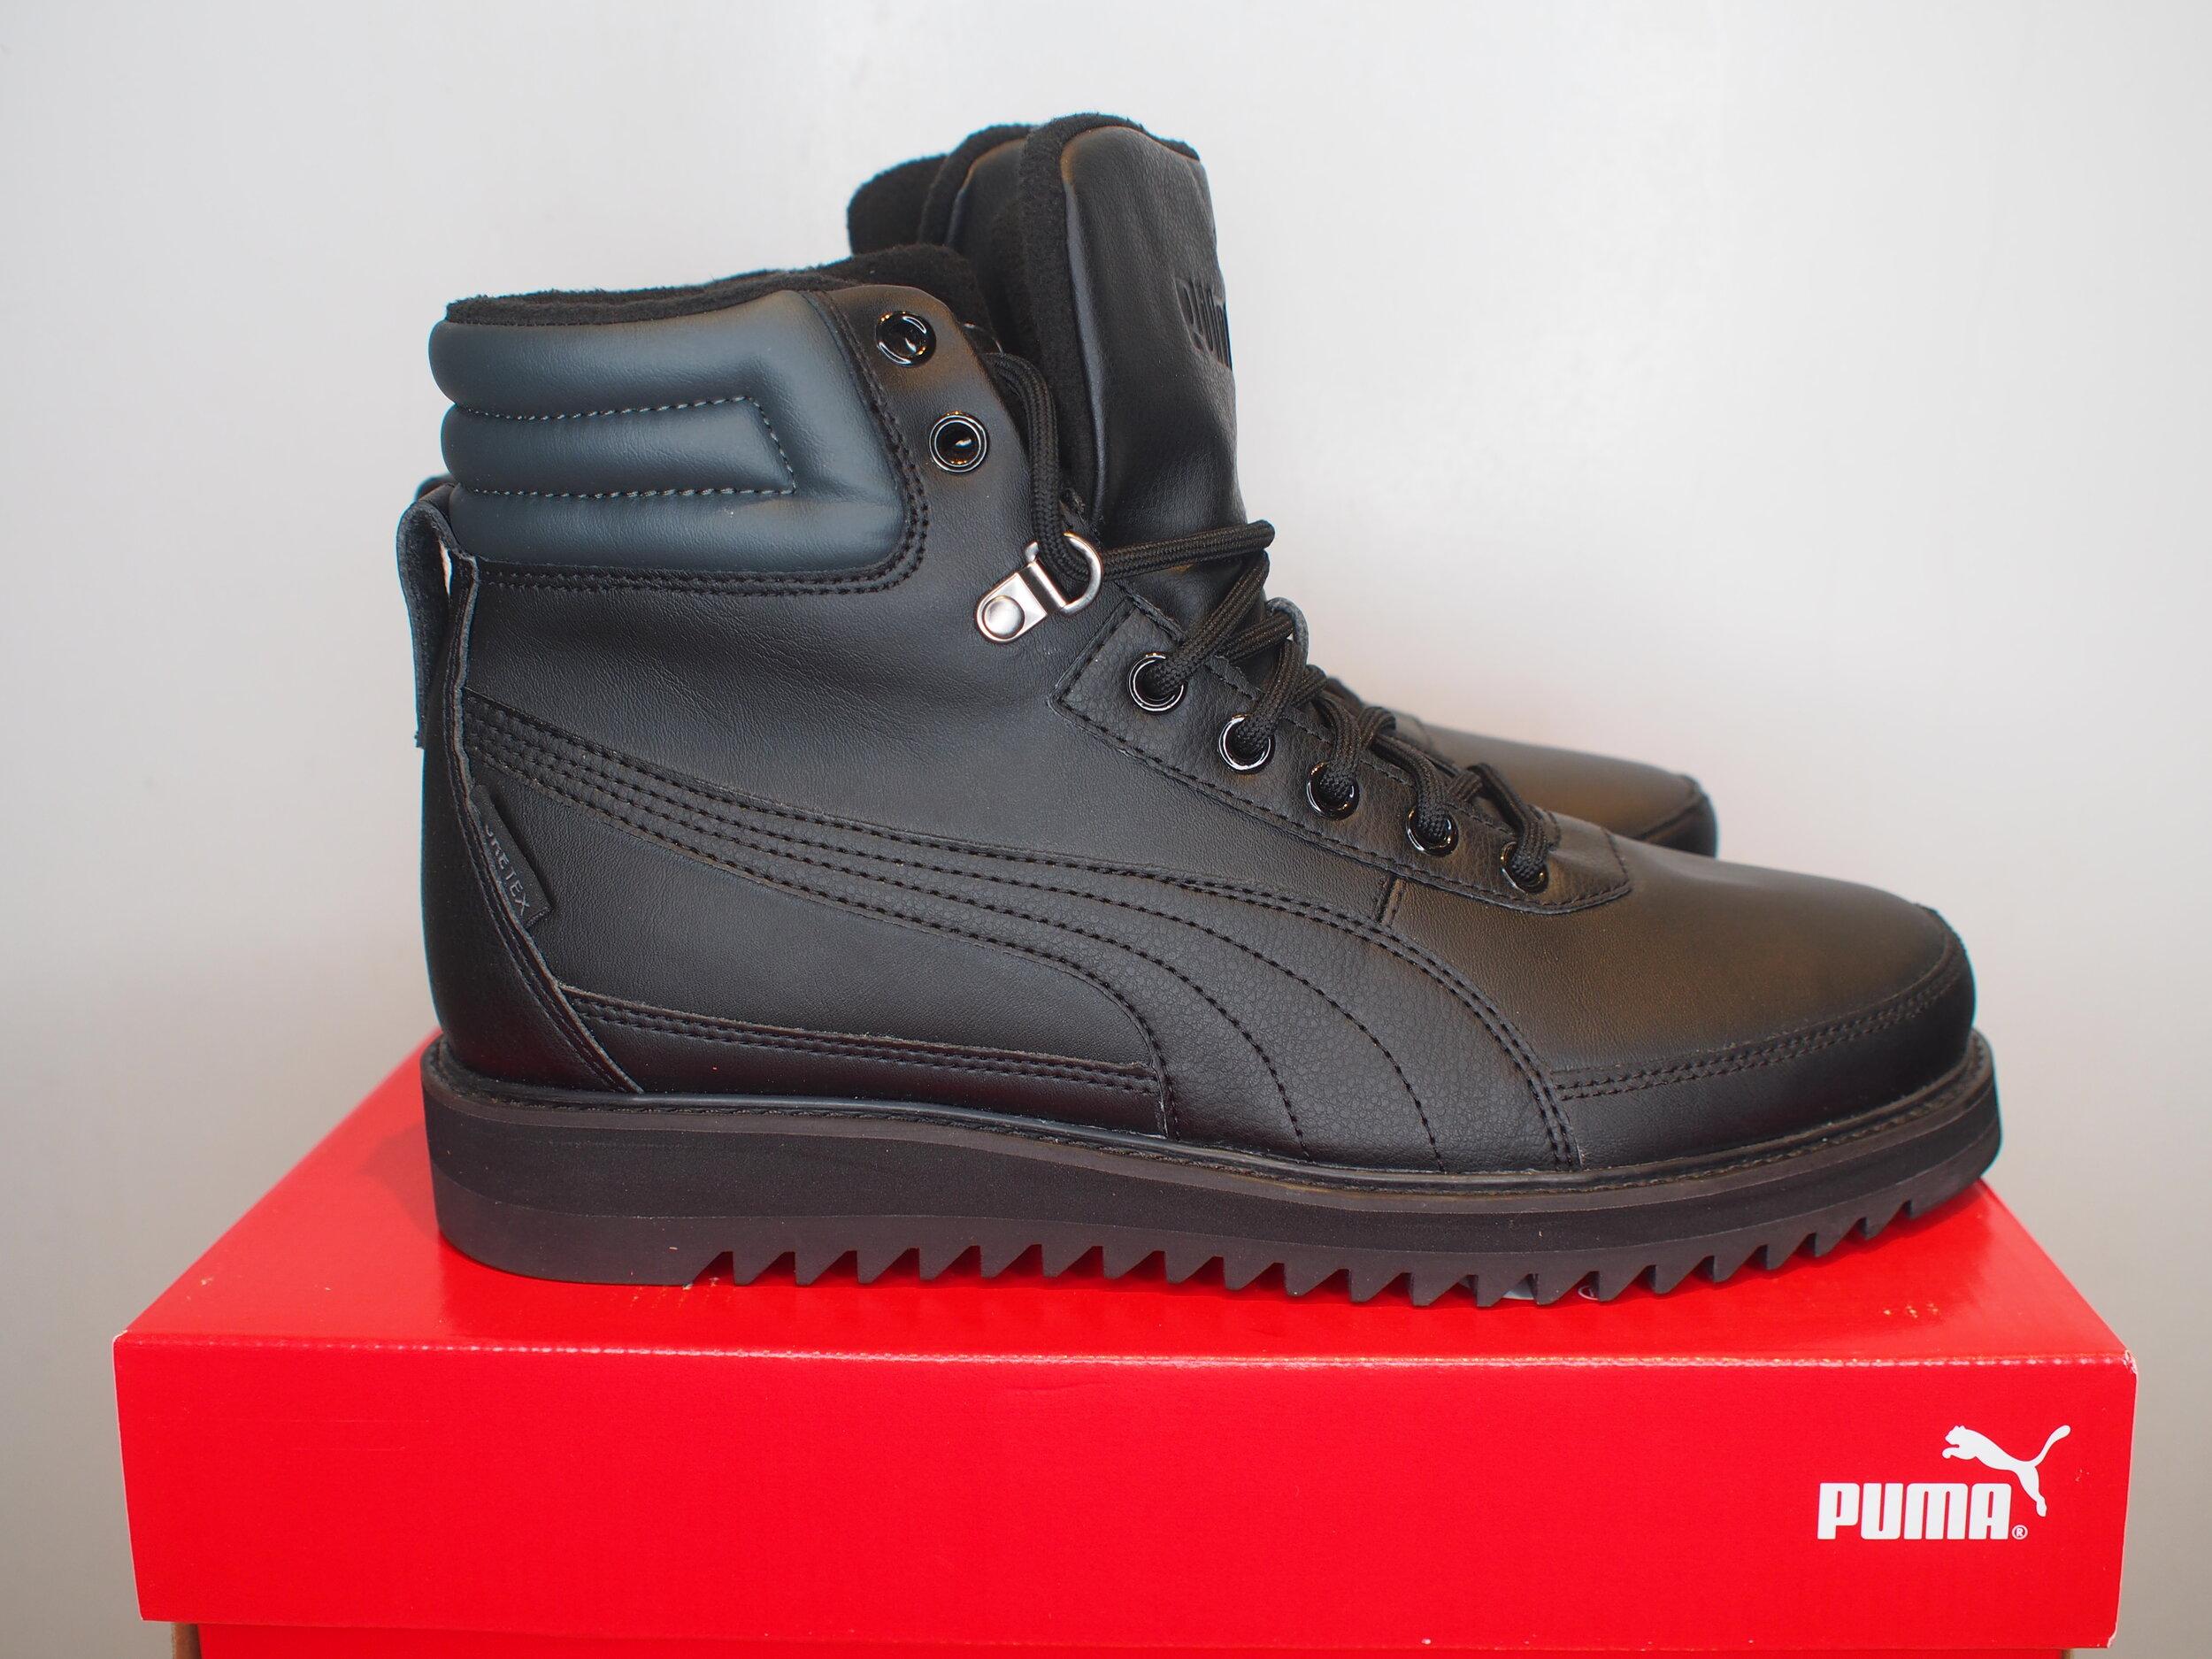 PUMA Desierto V2 PureTEX Weatherproof sneaker boots — global atomic designs inc